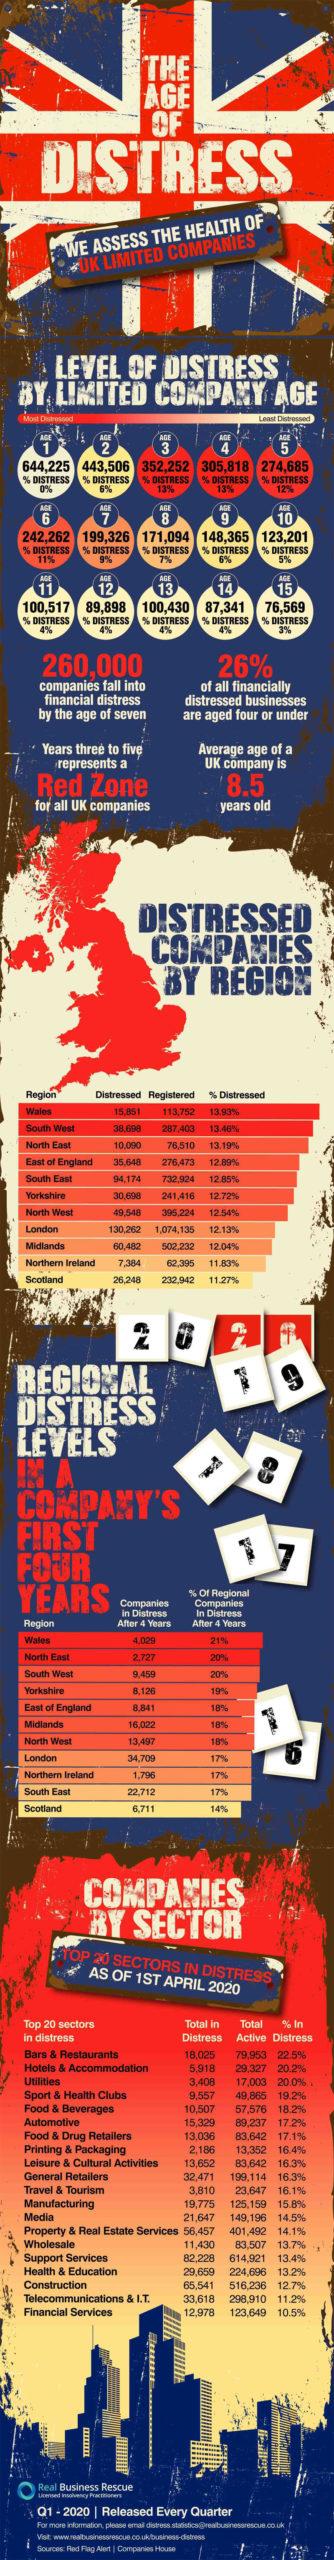 uk company distress q1 2020 infographic